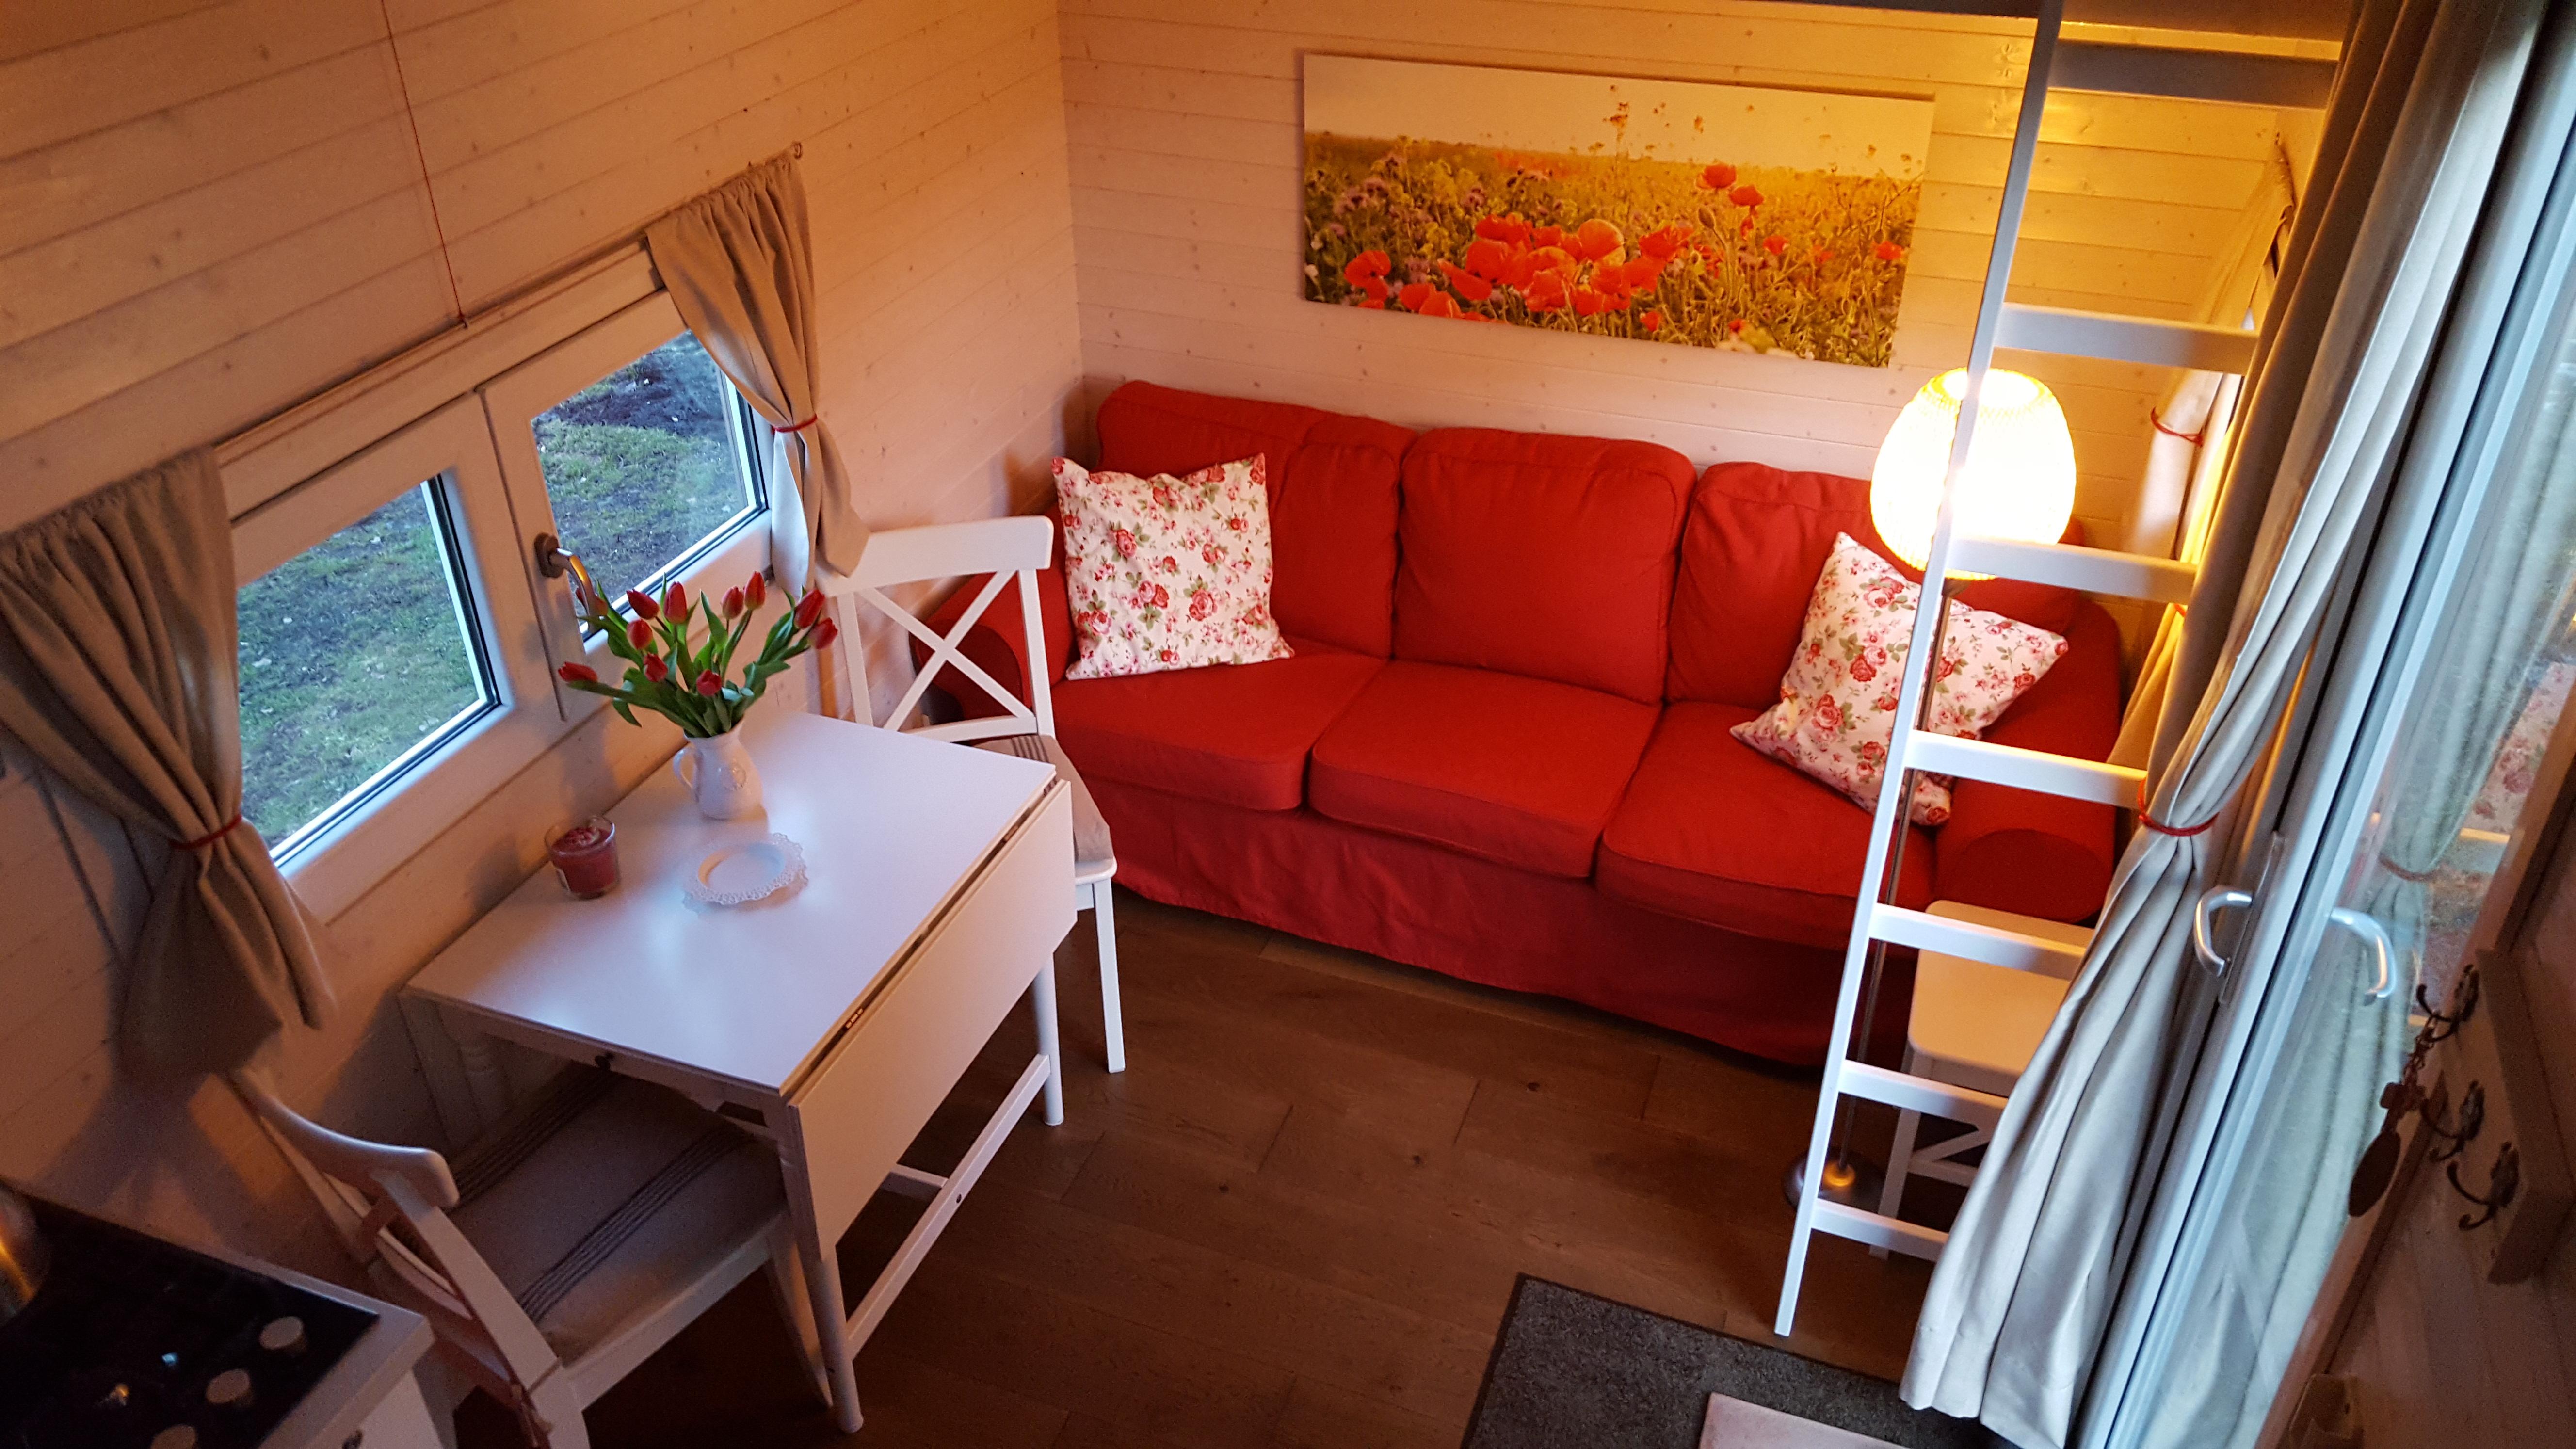 urlaub im tiny house hotel tiny house village. Black Bedroom Furniture Sets. Home Design Ideas